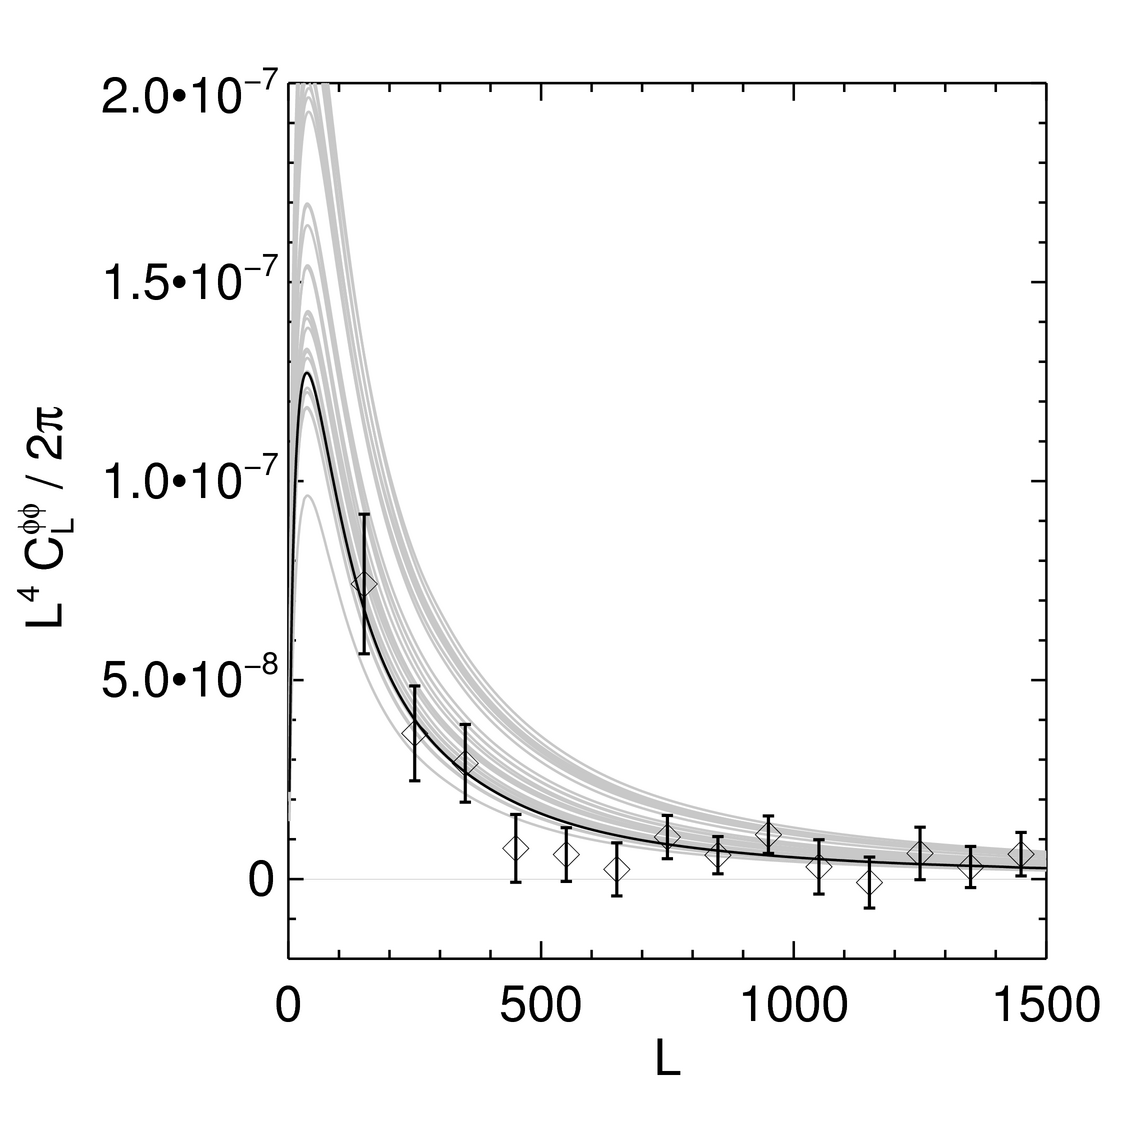 Spt Data For Van Engelen Et Al